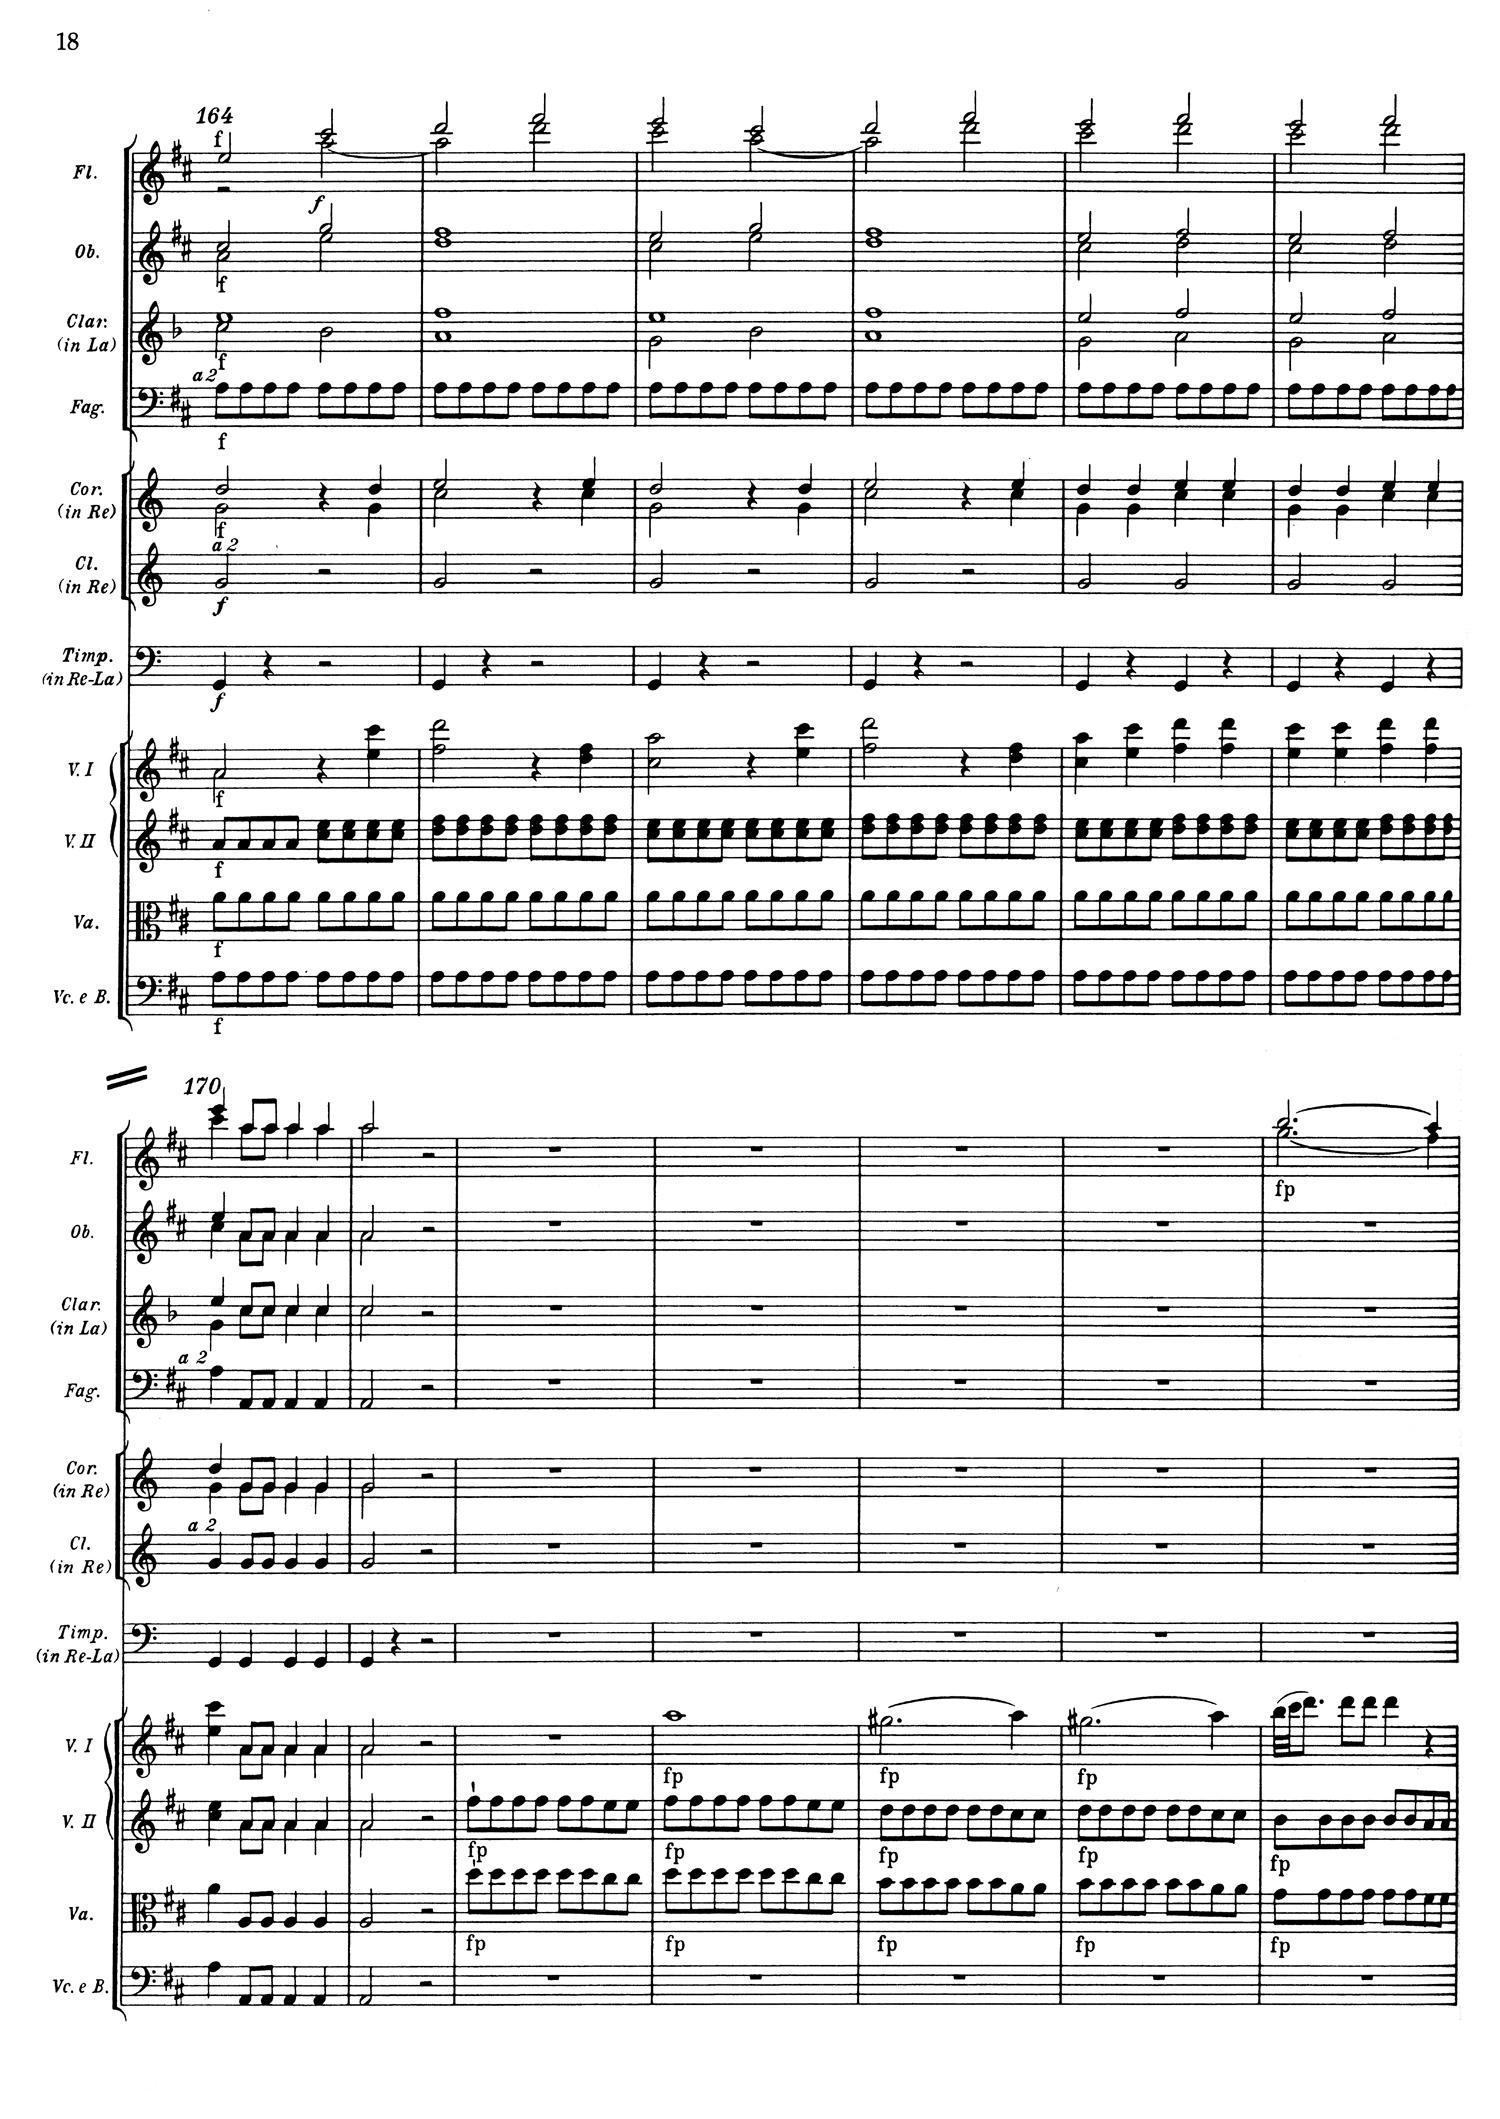 Mozart Figaro Score 10.jpg